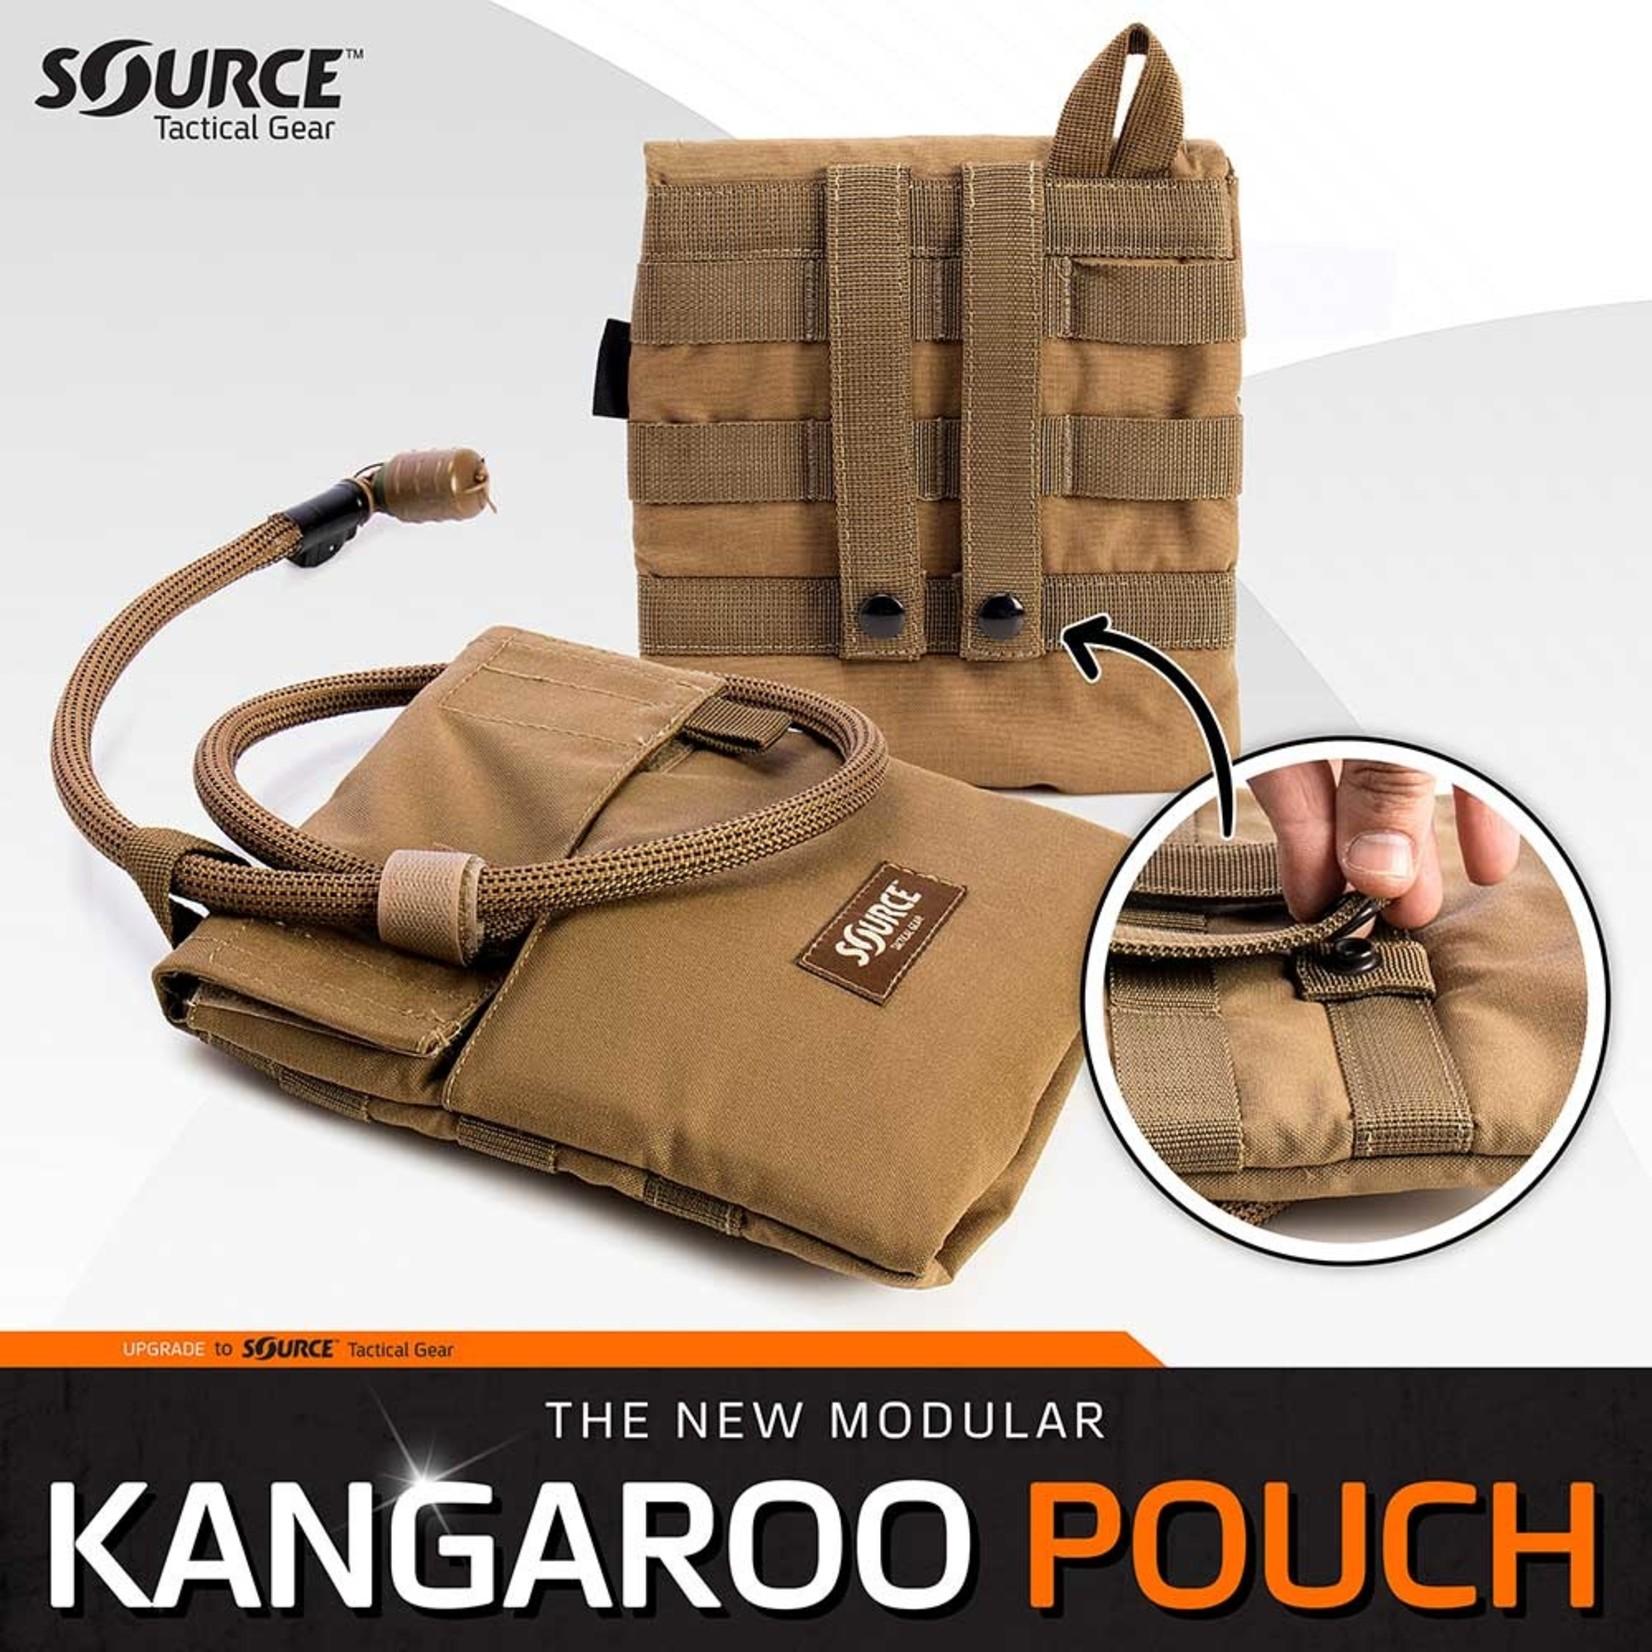 SOURCE TACTICAL GEAR GEAR KANGAROO 1L POUCH KIT